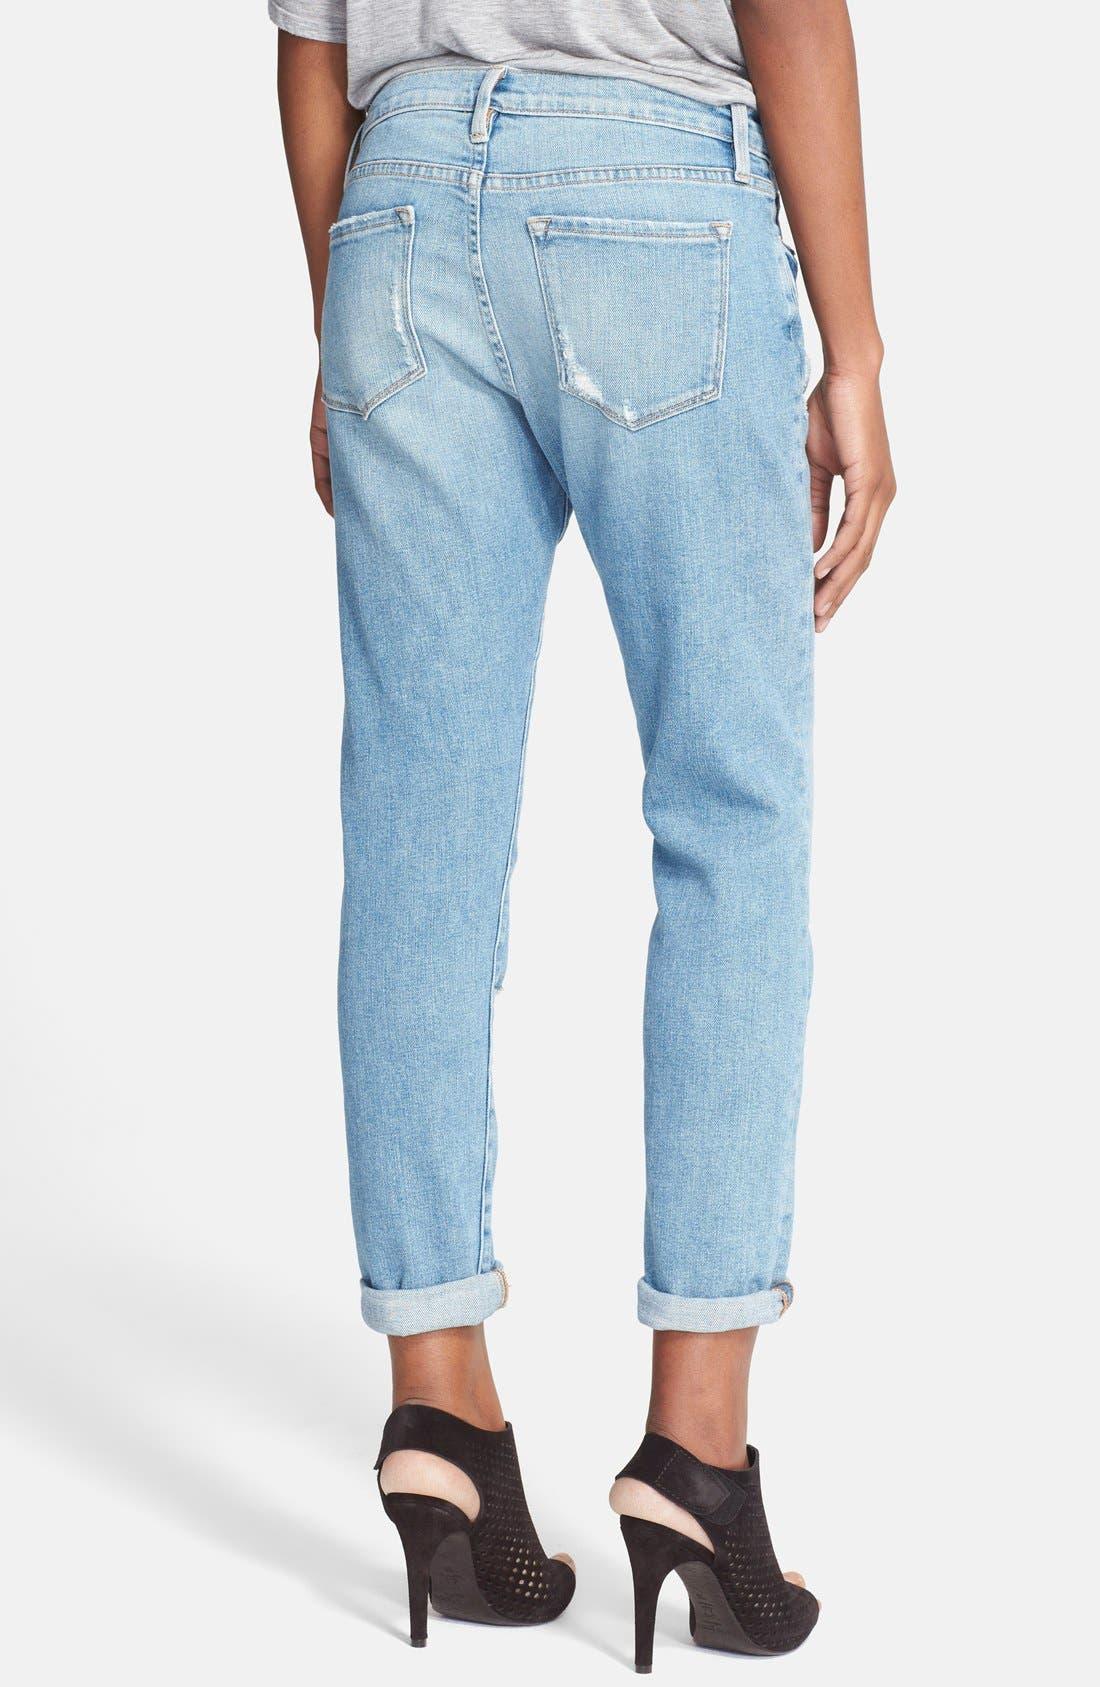 Alternate Image 2  - Frame Denim 'Le Garcon' Boyfriend Jeans (Beek Street)